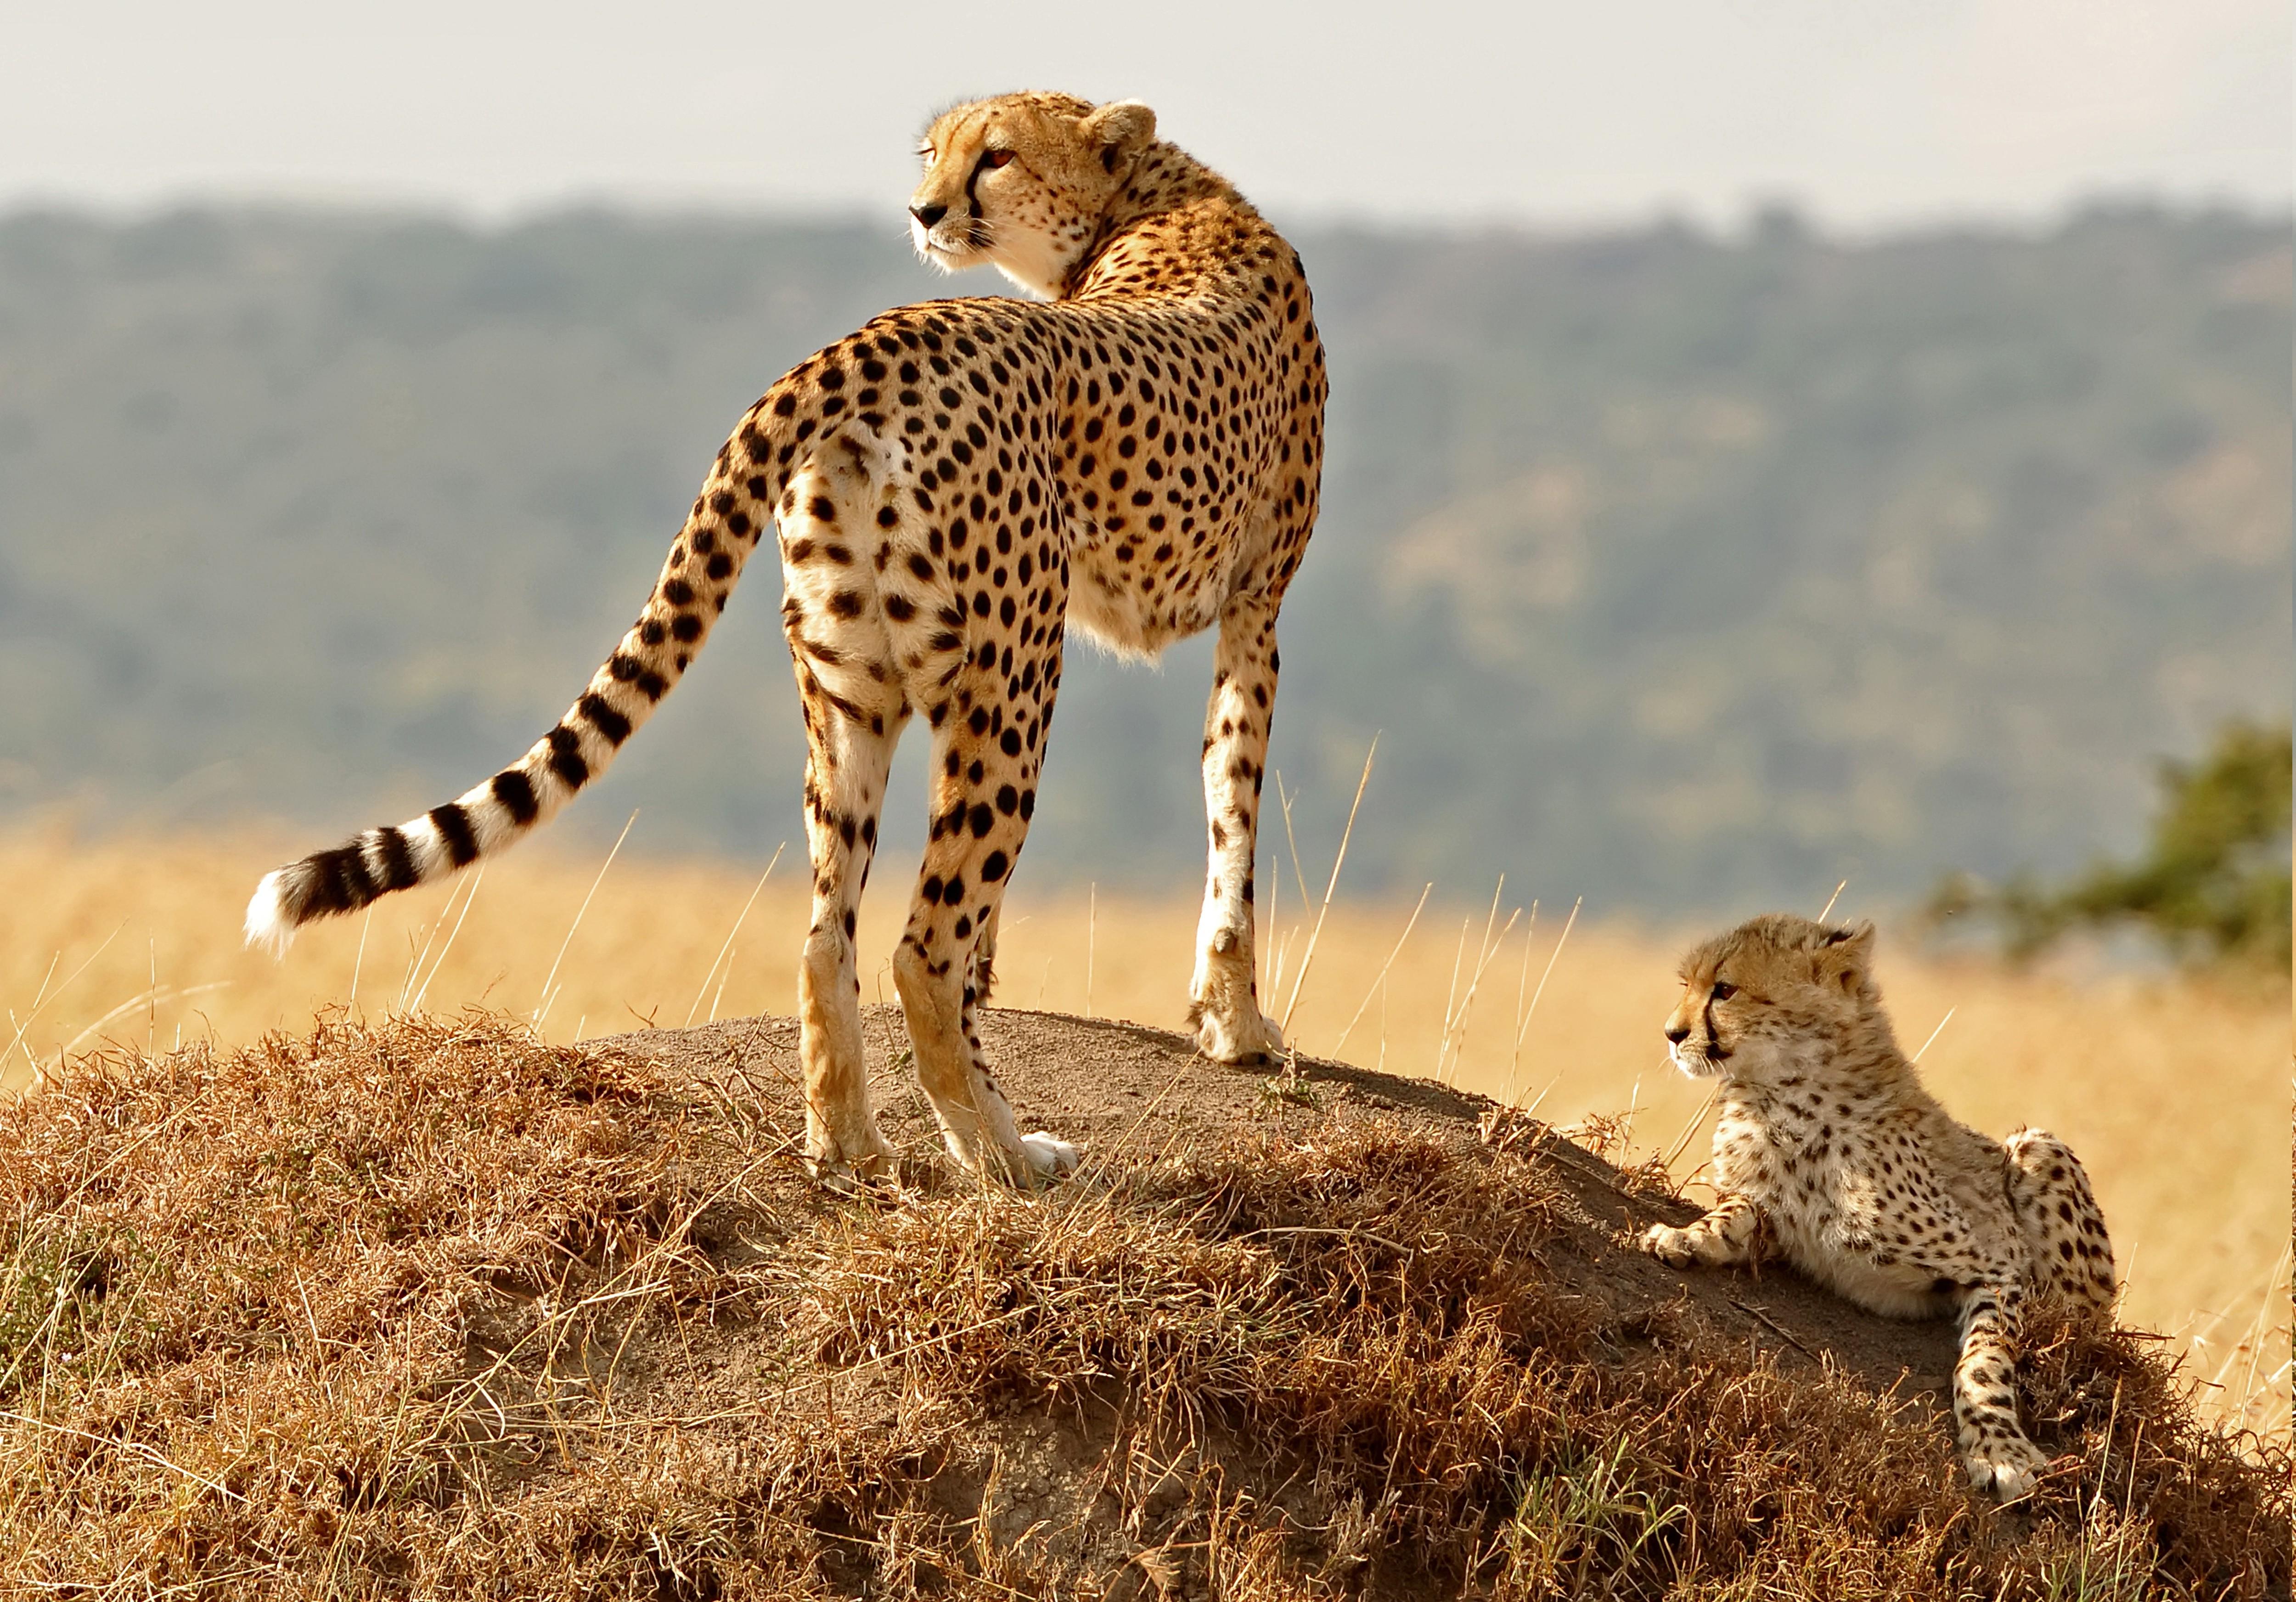 Sfondi animali natura leopardo ghepardo ghepardi for Sfondi animali hd